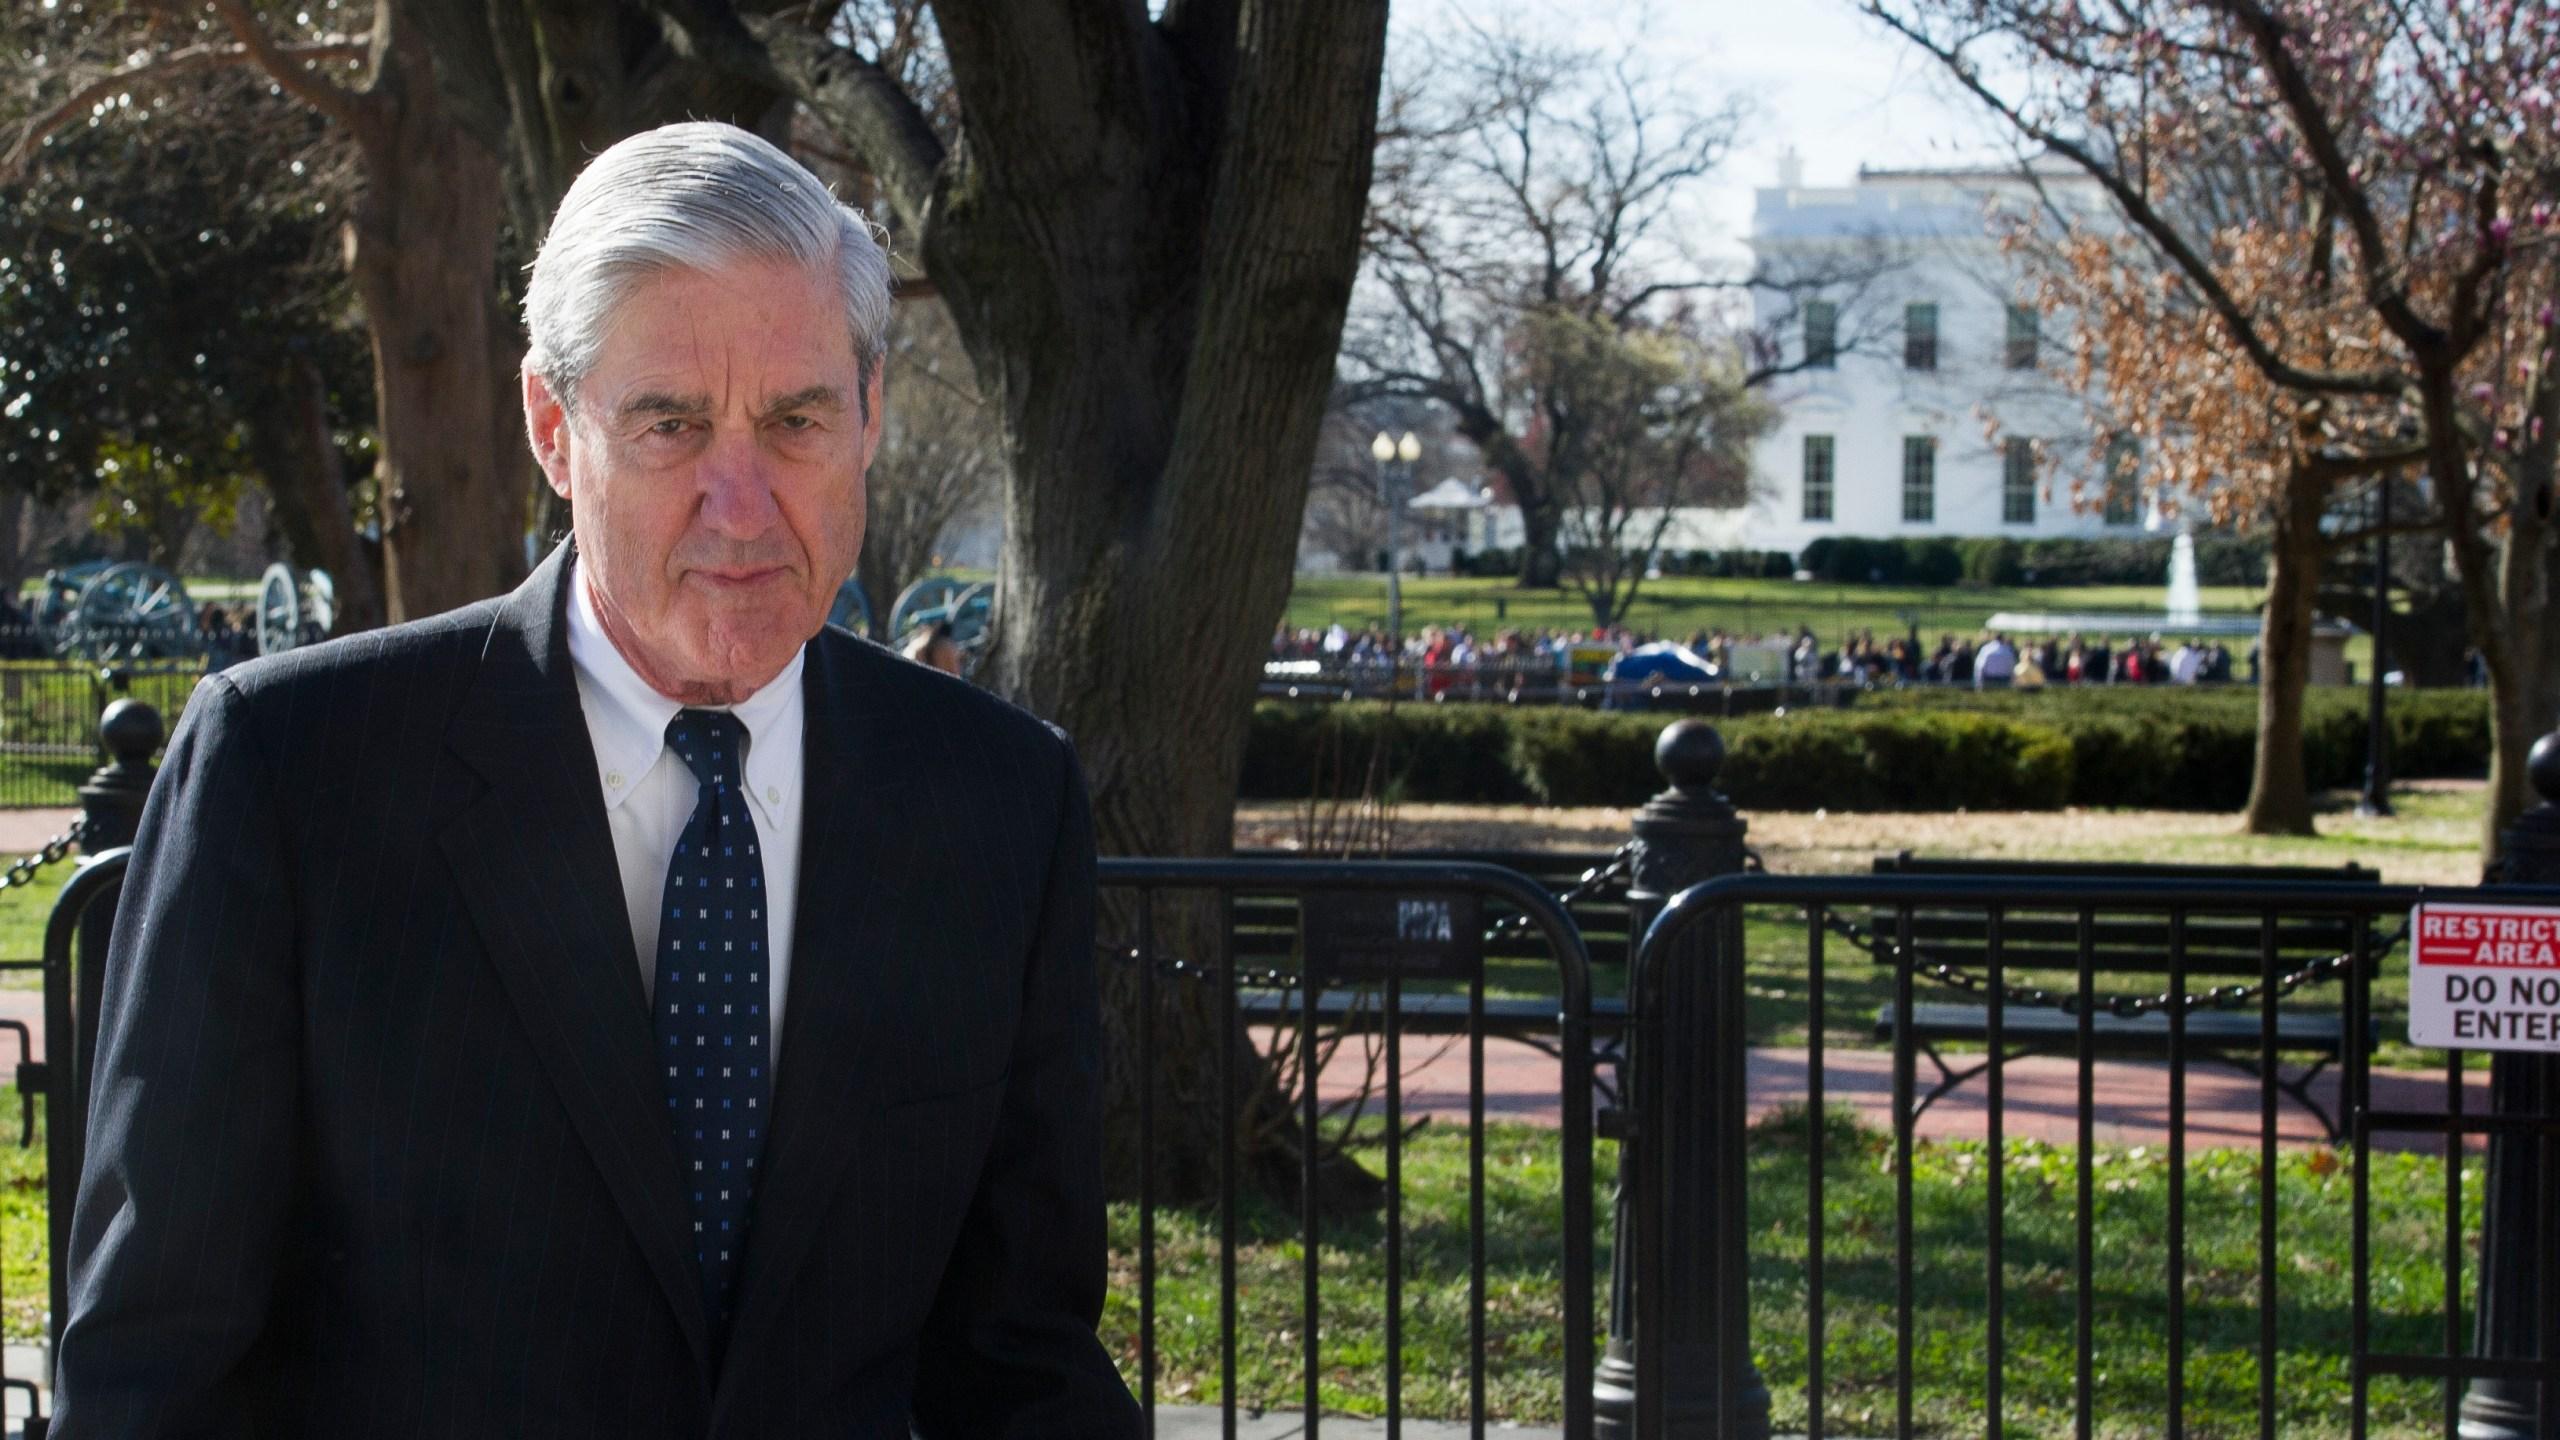 Mueller_Report_What_We've_Learned_89826-159532.jpg71295419